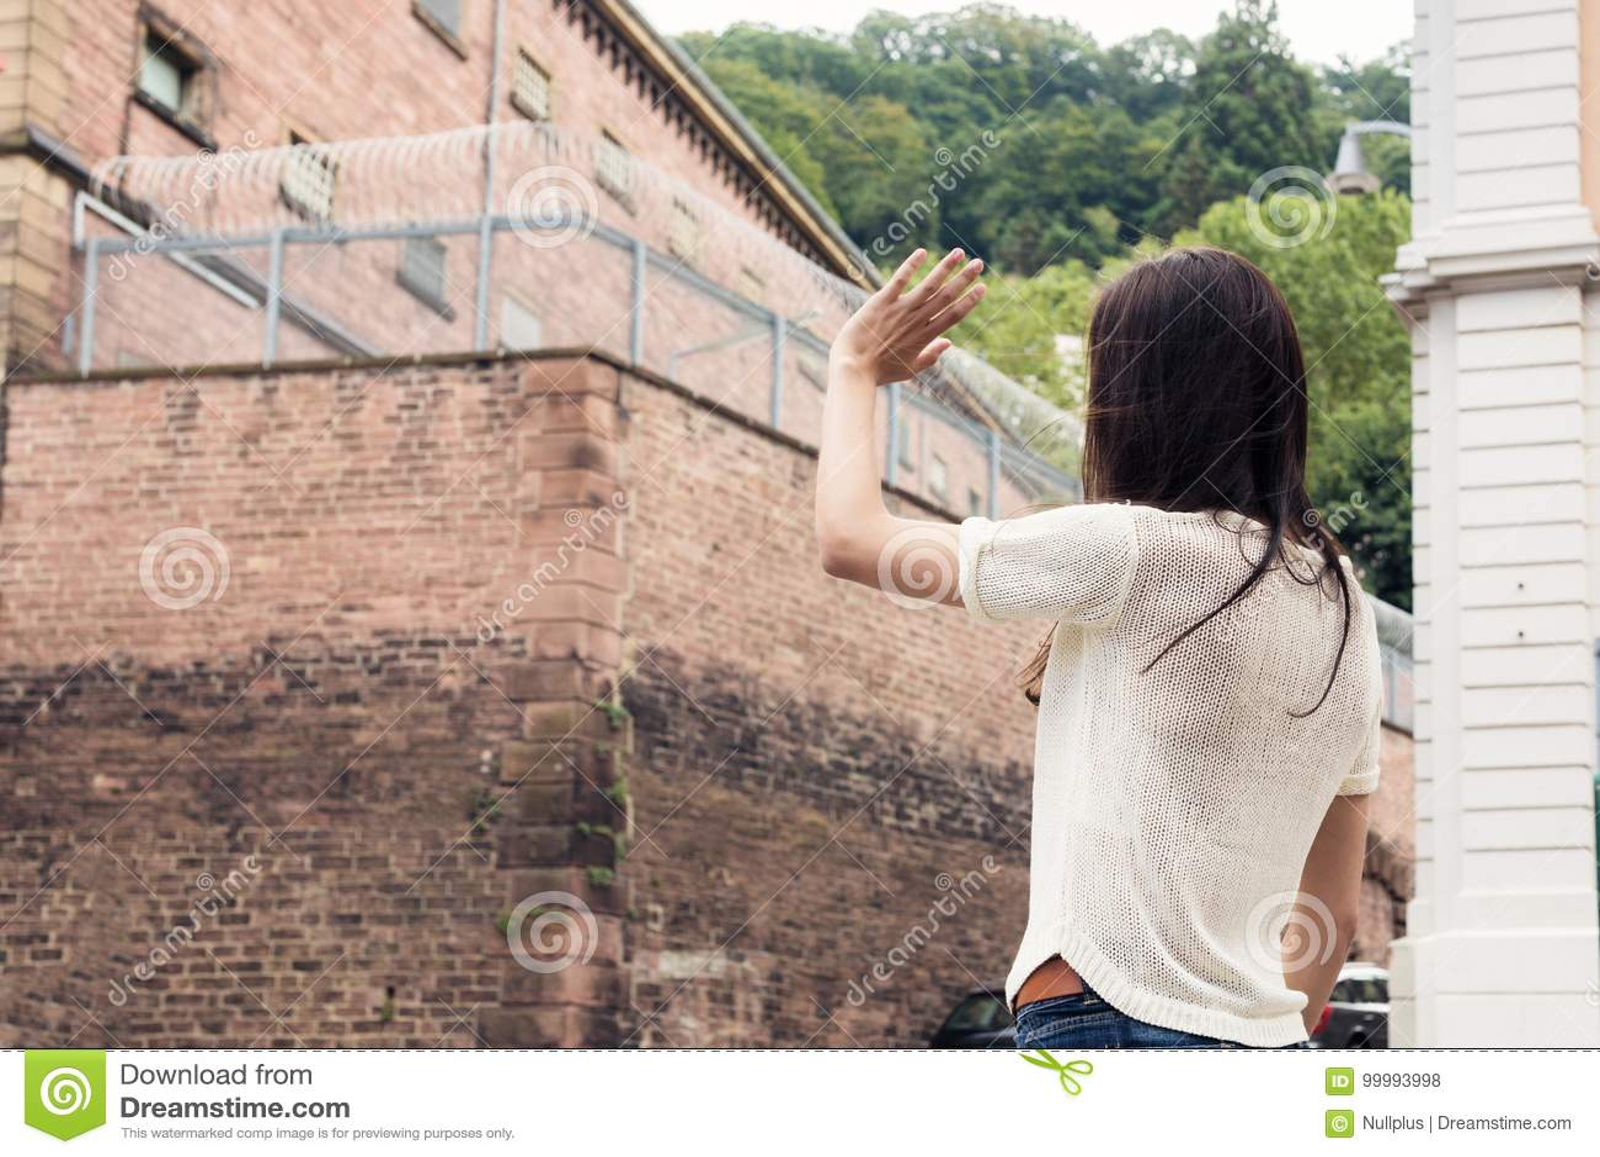 Mlles Her Imprisoned Boyfriend de jeune femme